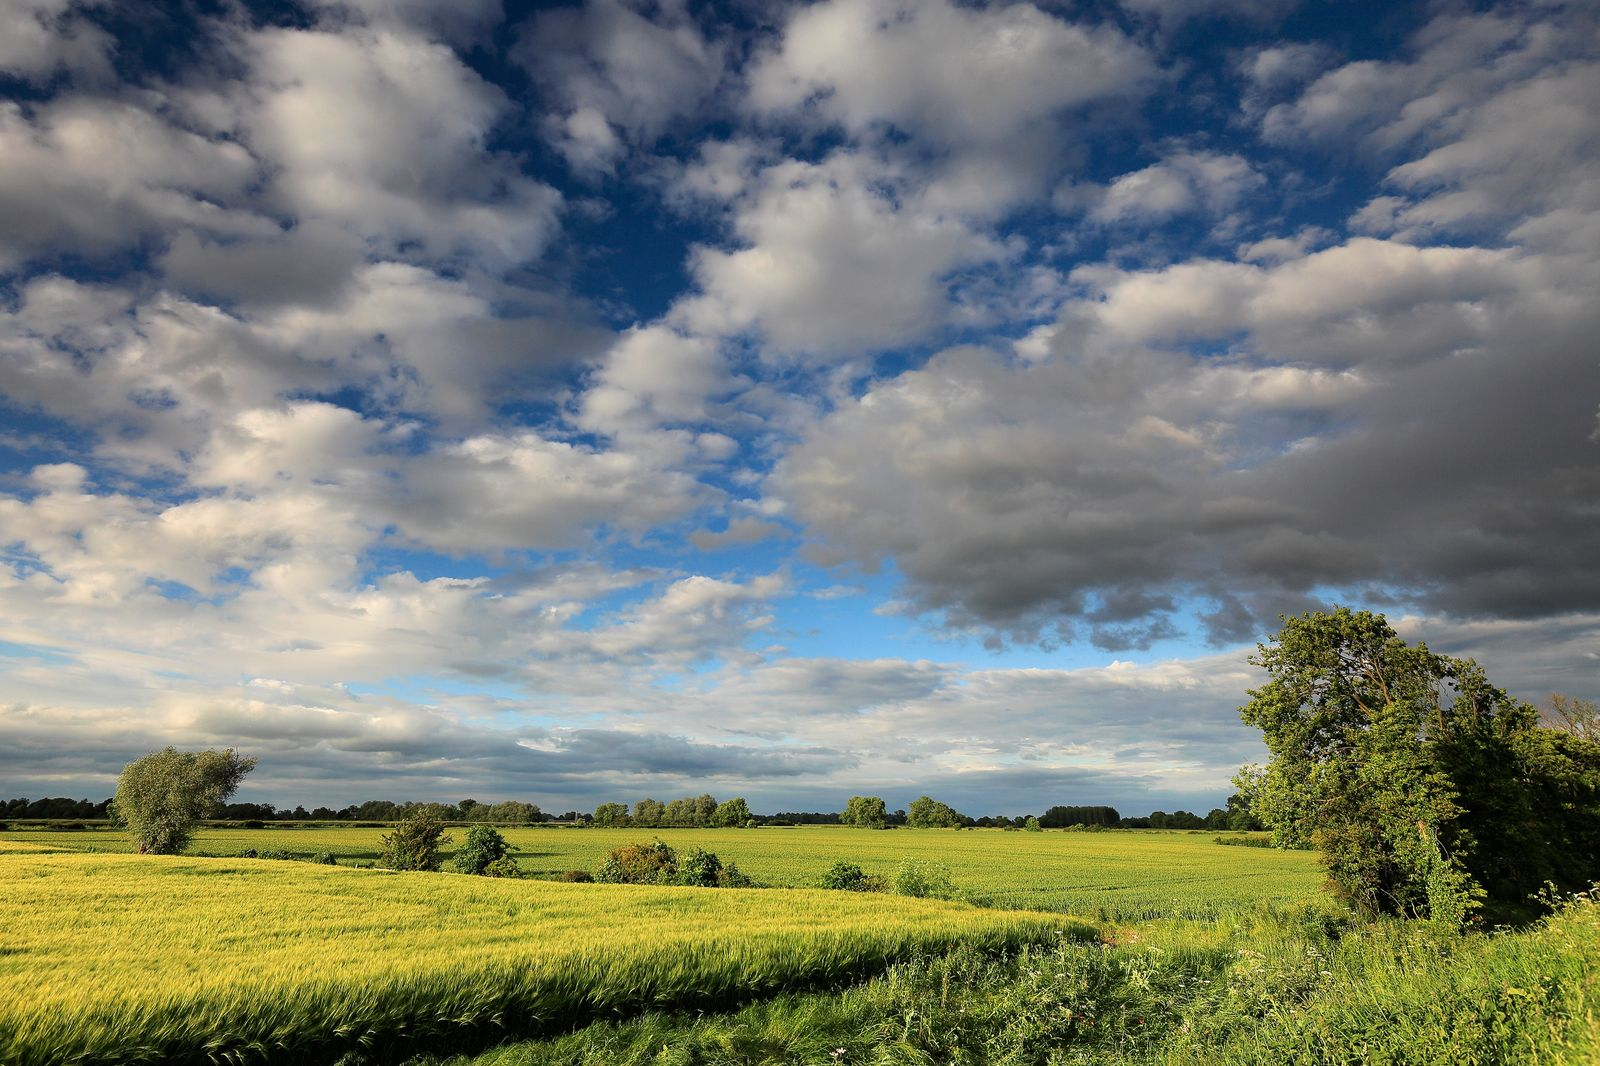 Summer barley crop in a Fenland Field, Wisbech town, Cambridgesh